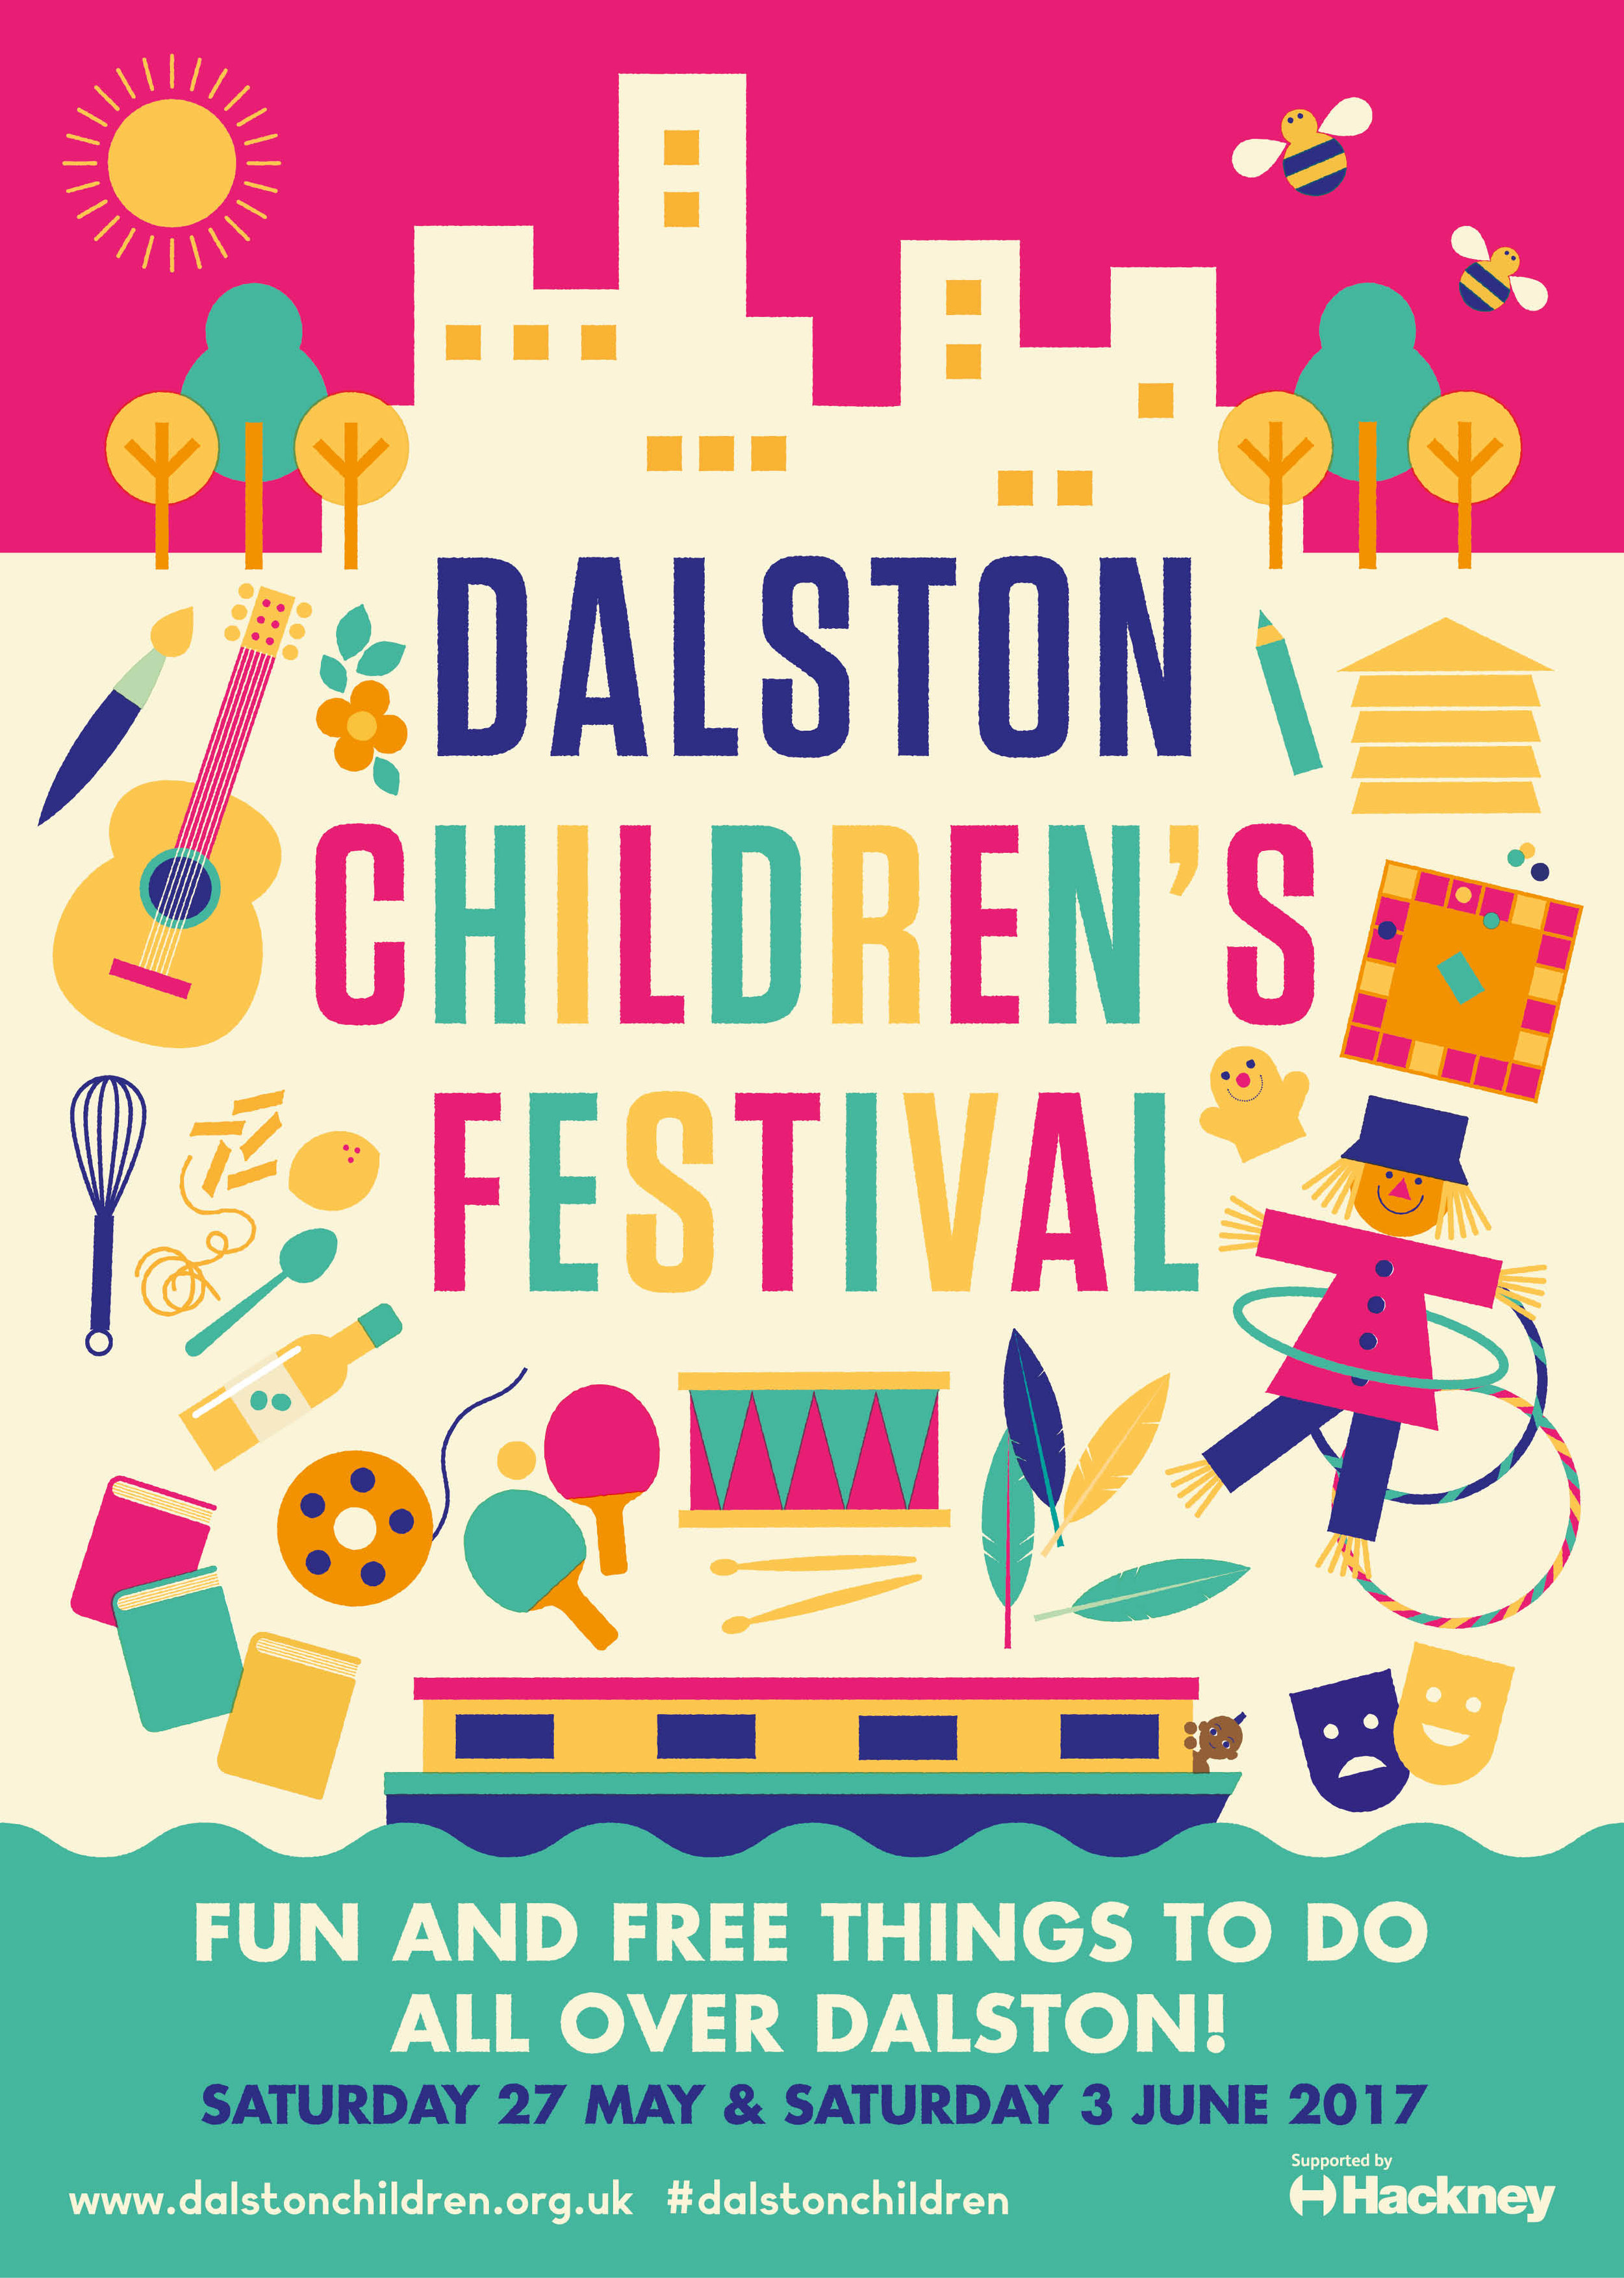 Dalston Children's Festival-poster_2017_WEB version.jpg